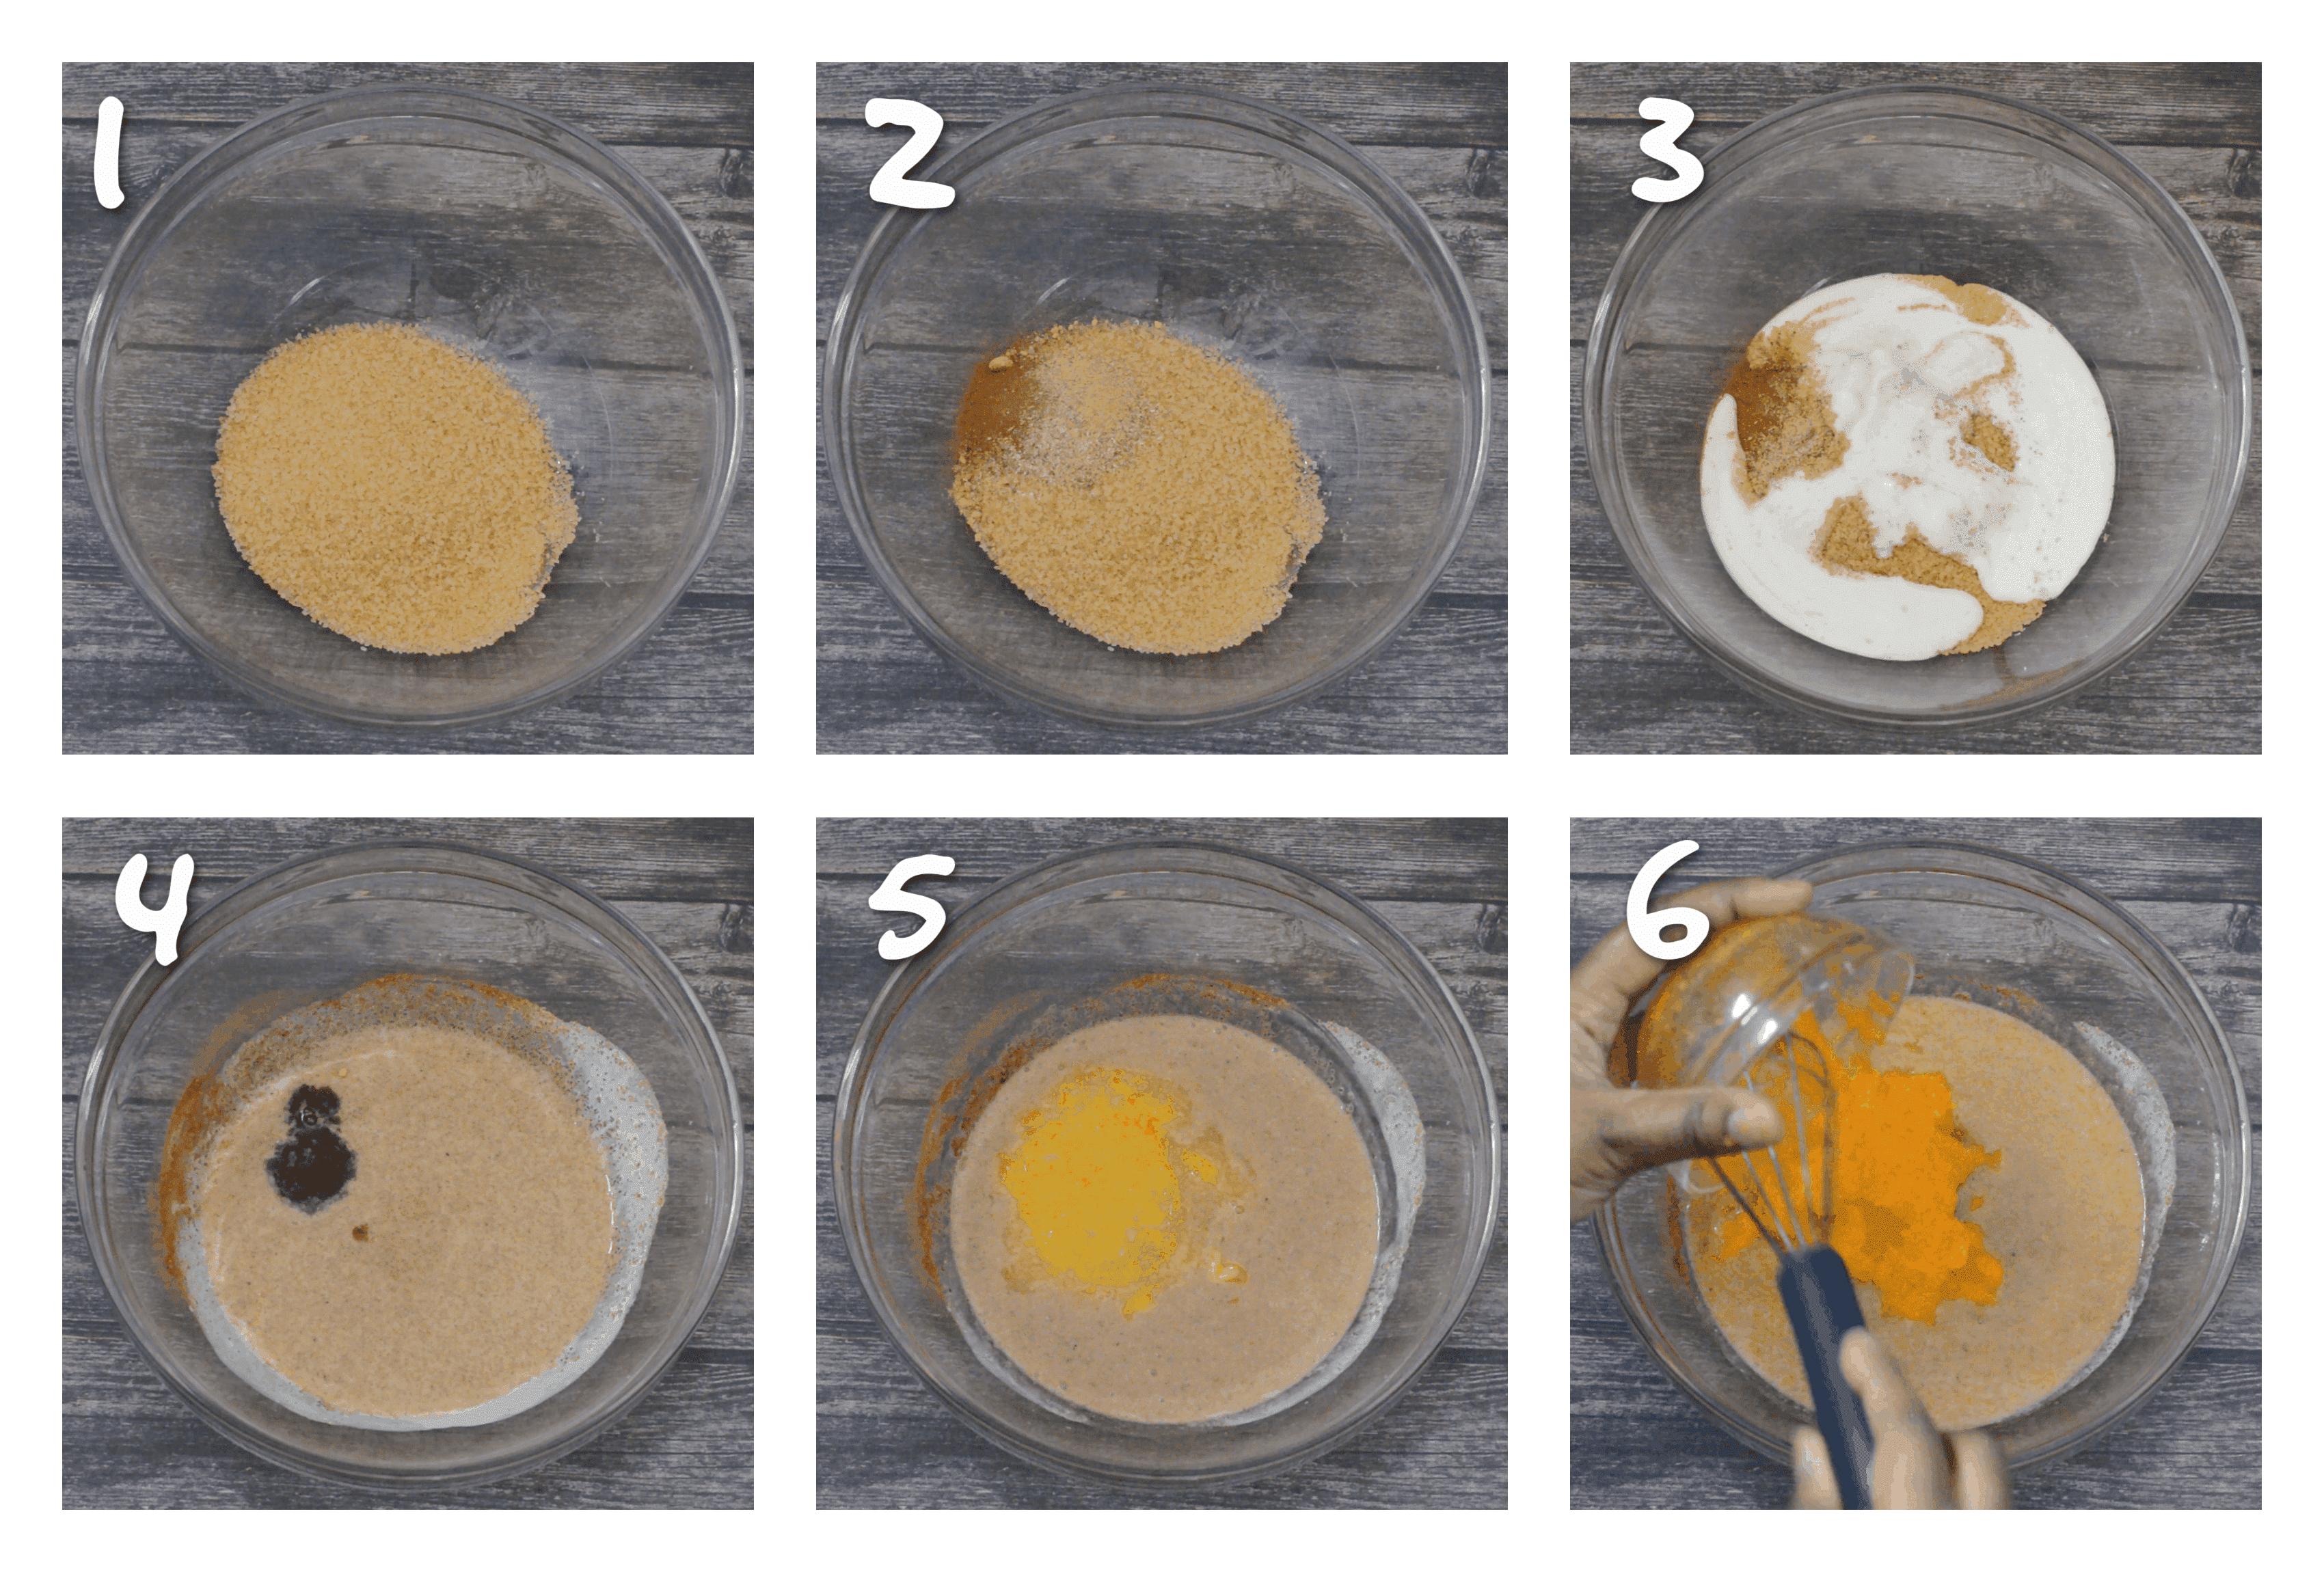 steps1-6 adding the sugar milk and pumpkin